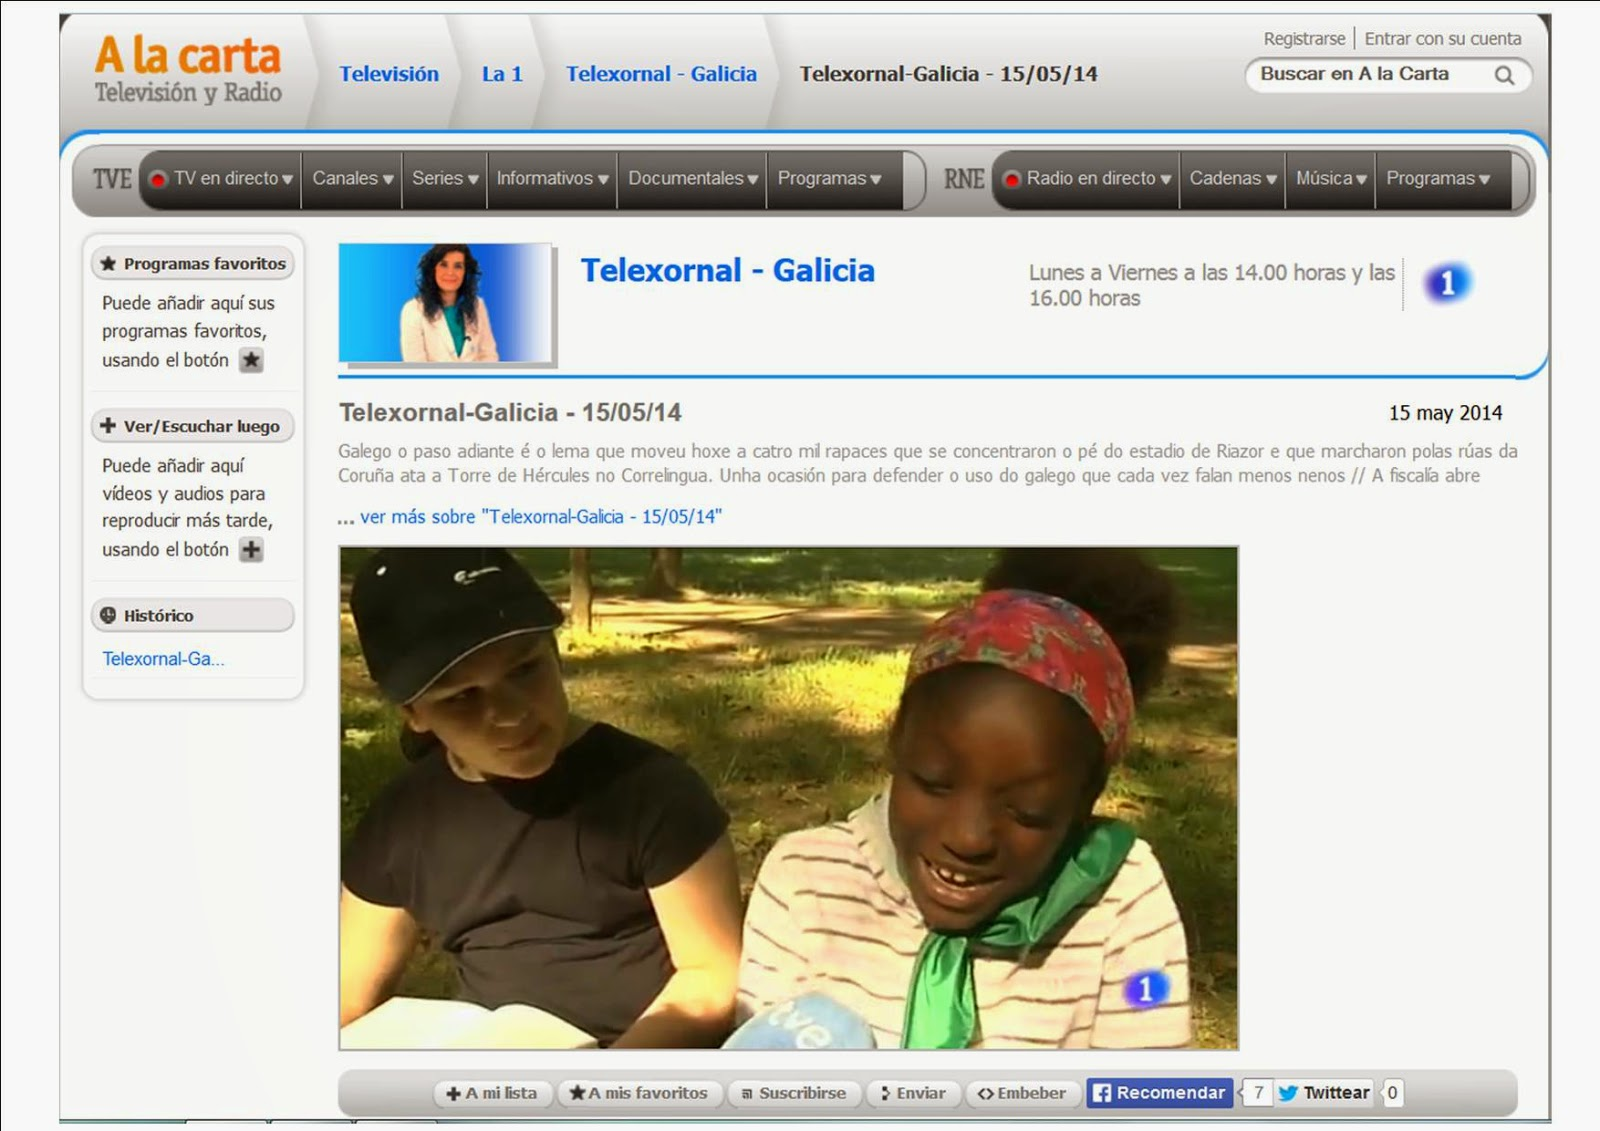 http://www.rtve.es/alacarta/videos/telexornal-galicia/telexornal-galicia-15-05-14/2565635/